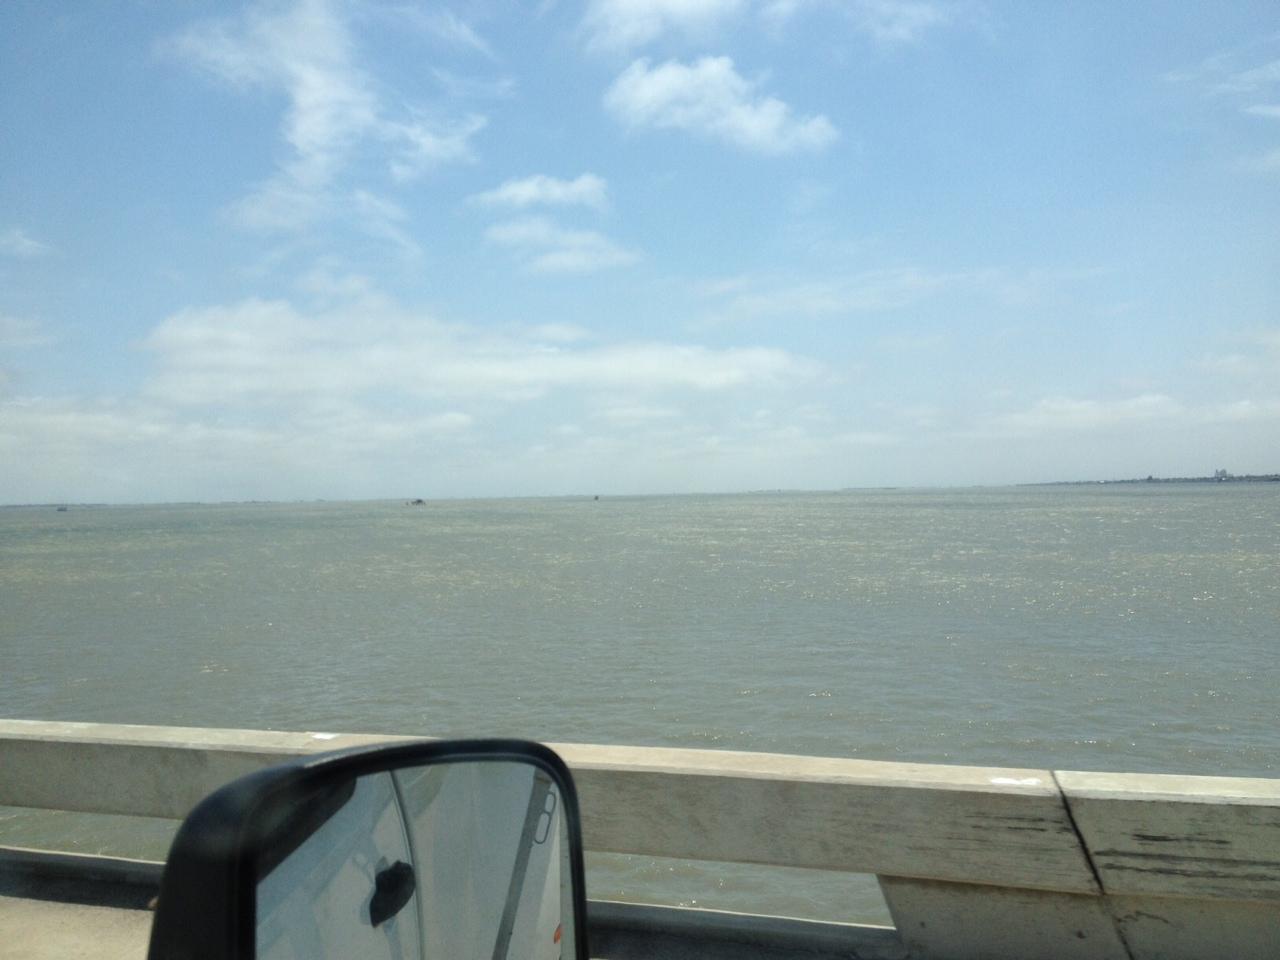 In Search of: Bridge to Padre Island National Seashore